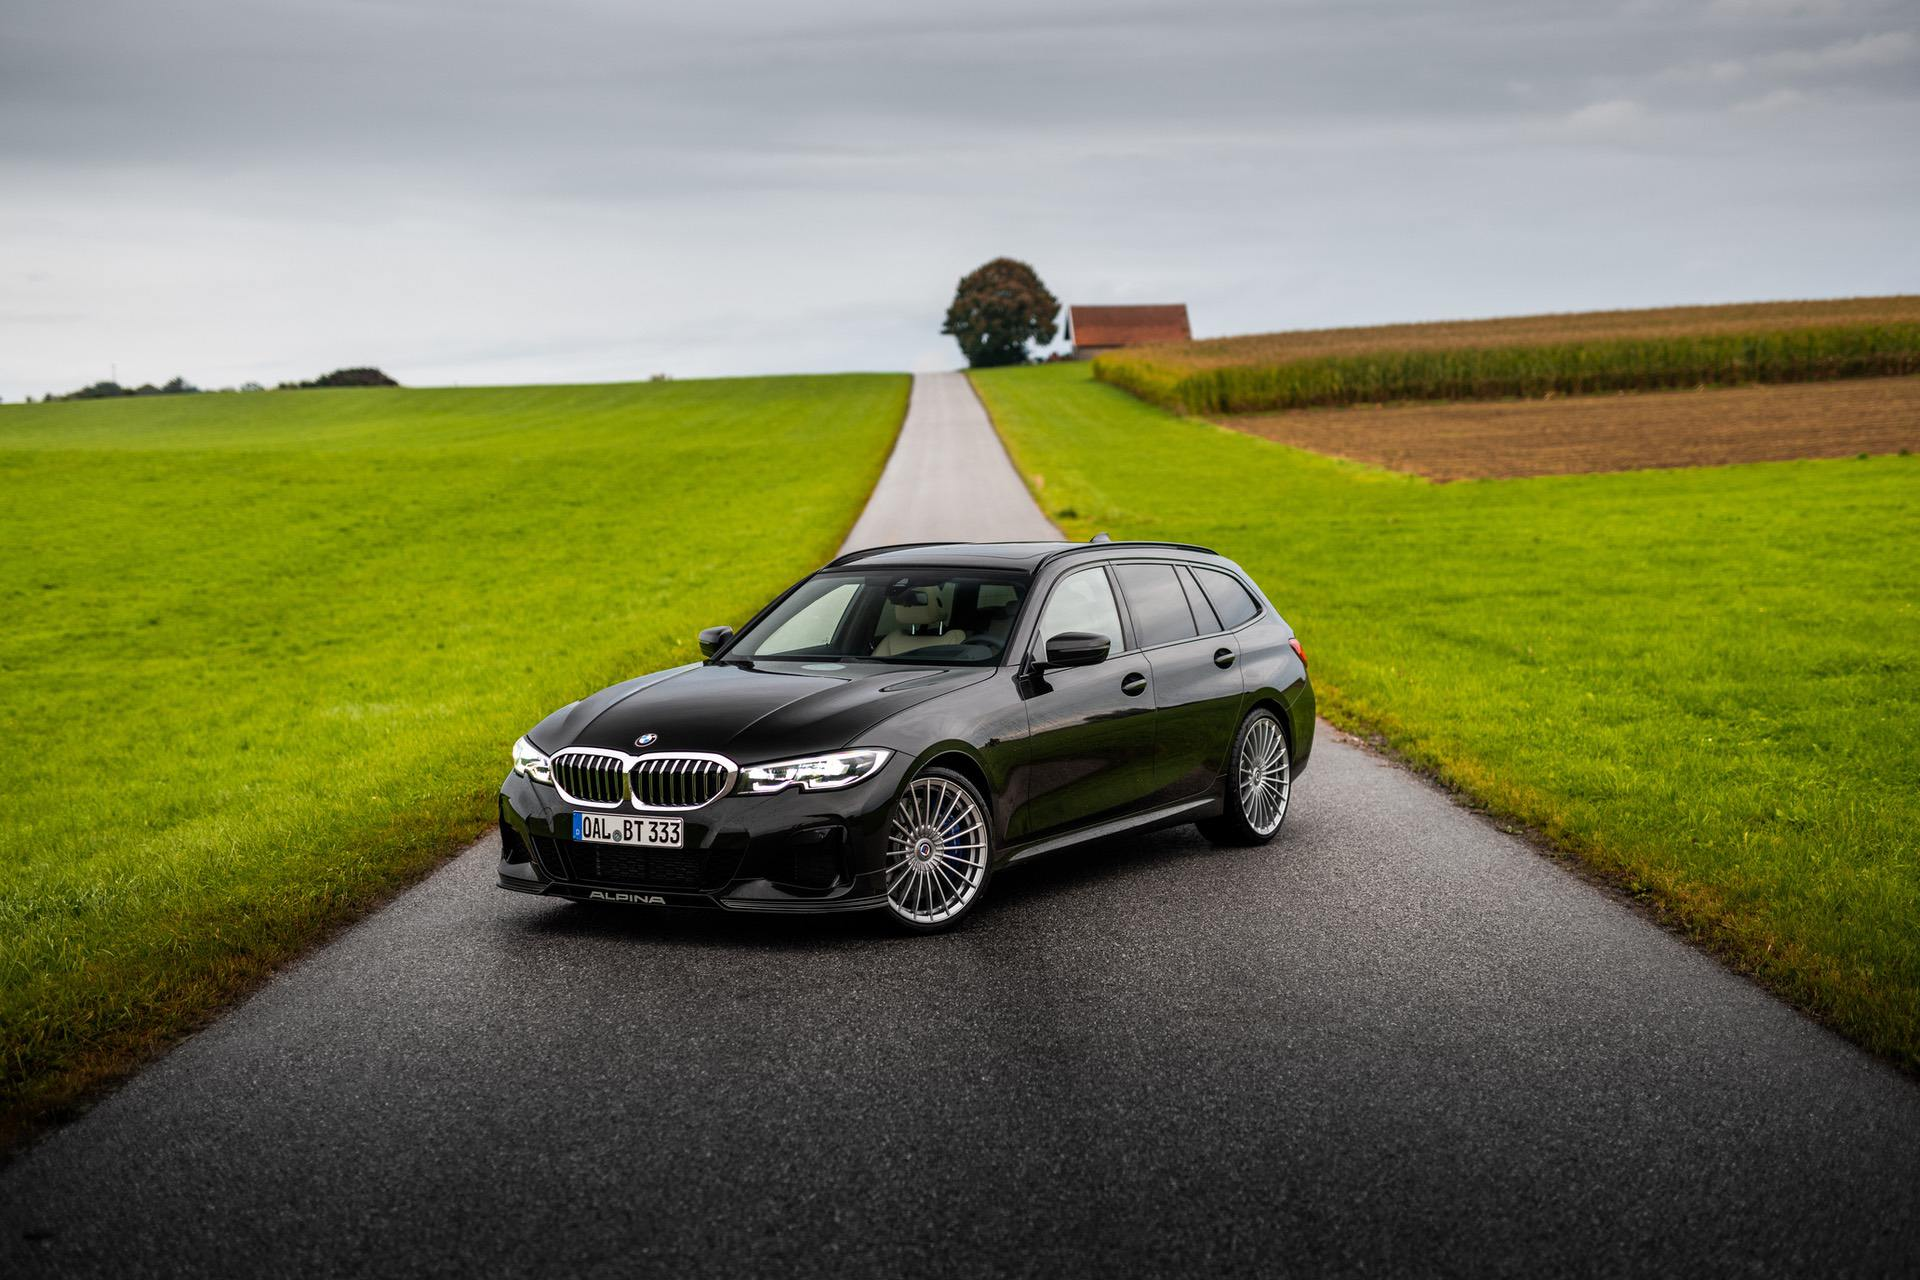 Видео: Alpina B3 Touring Review называет его суррогатом M3 Touring